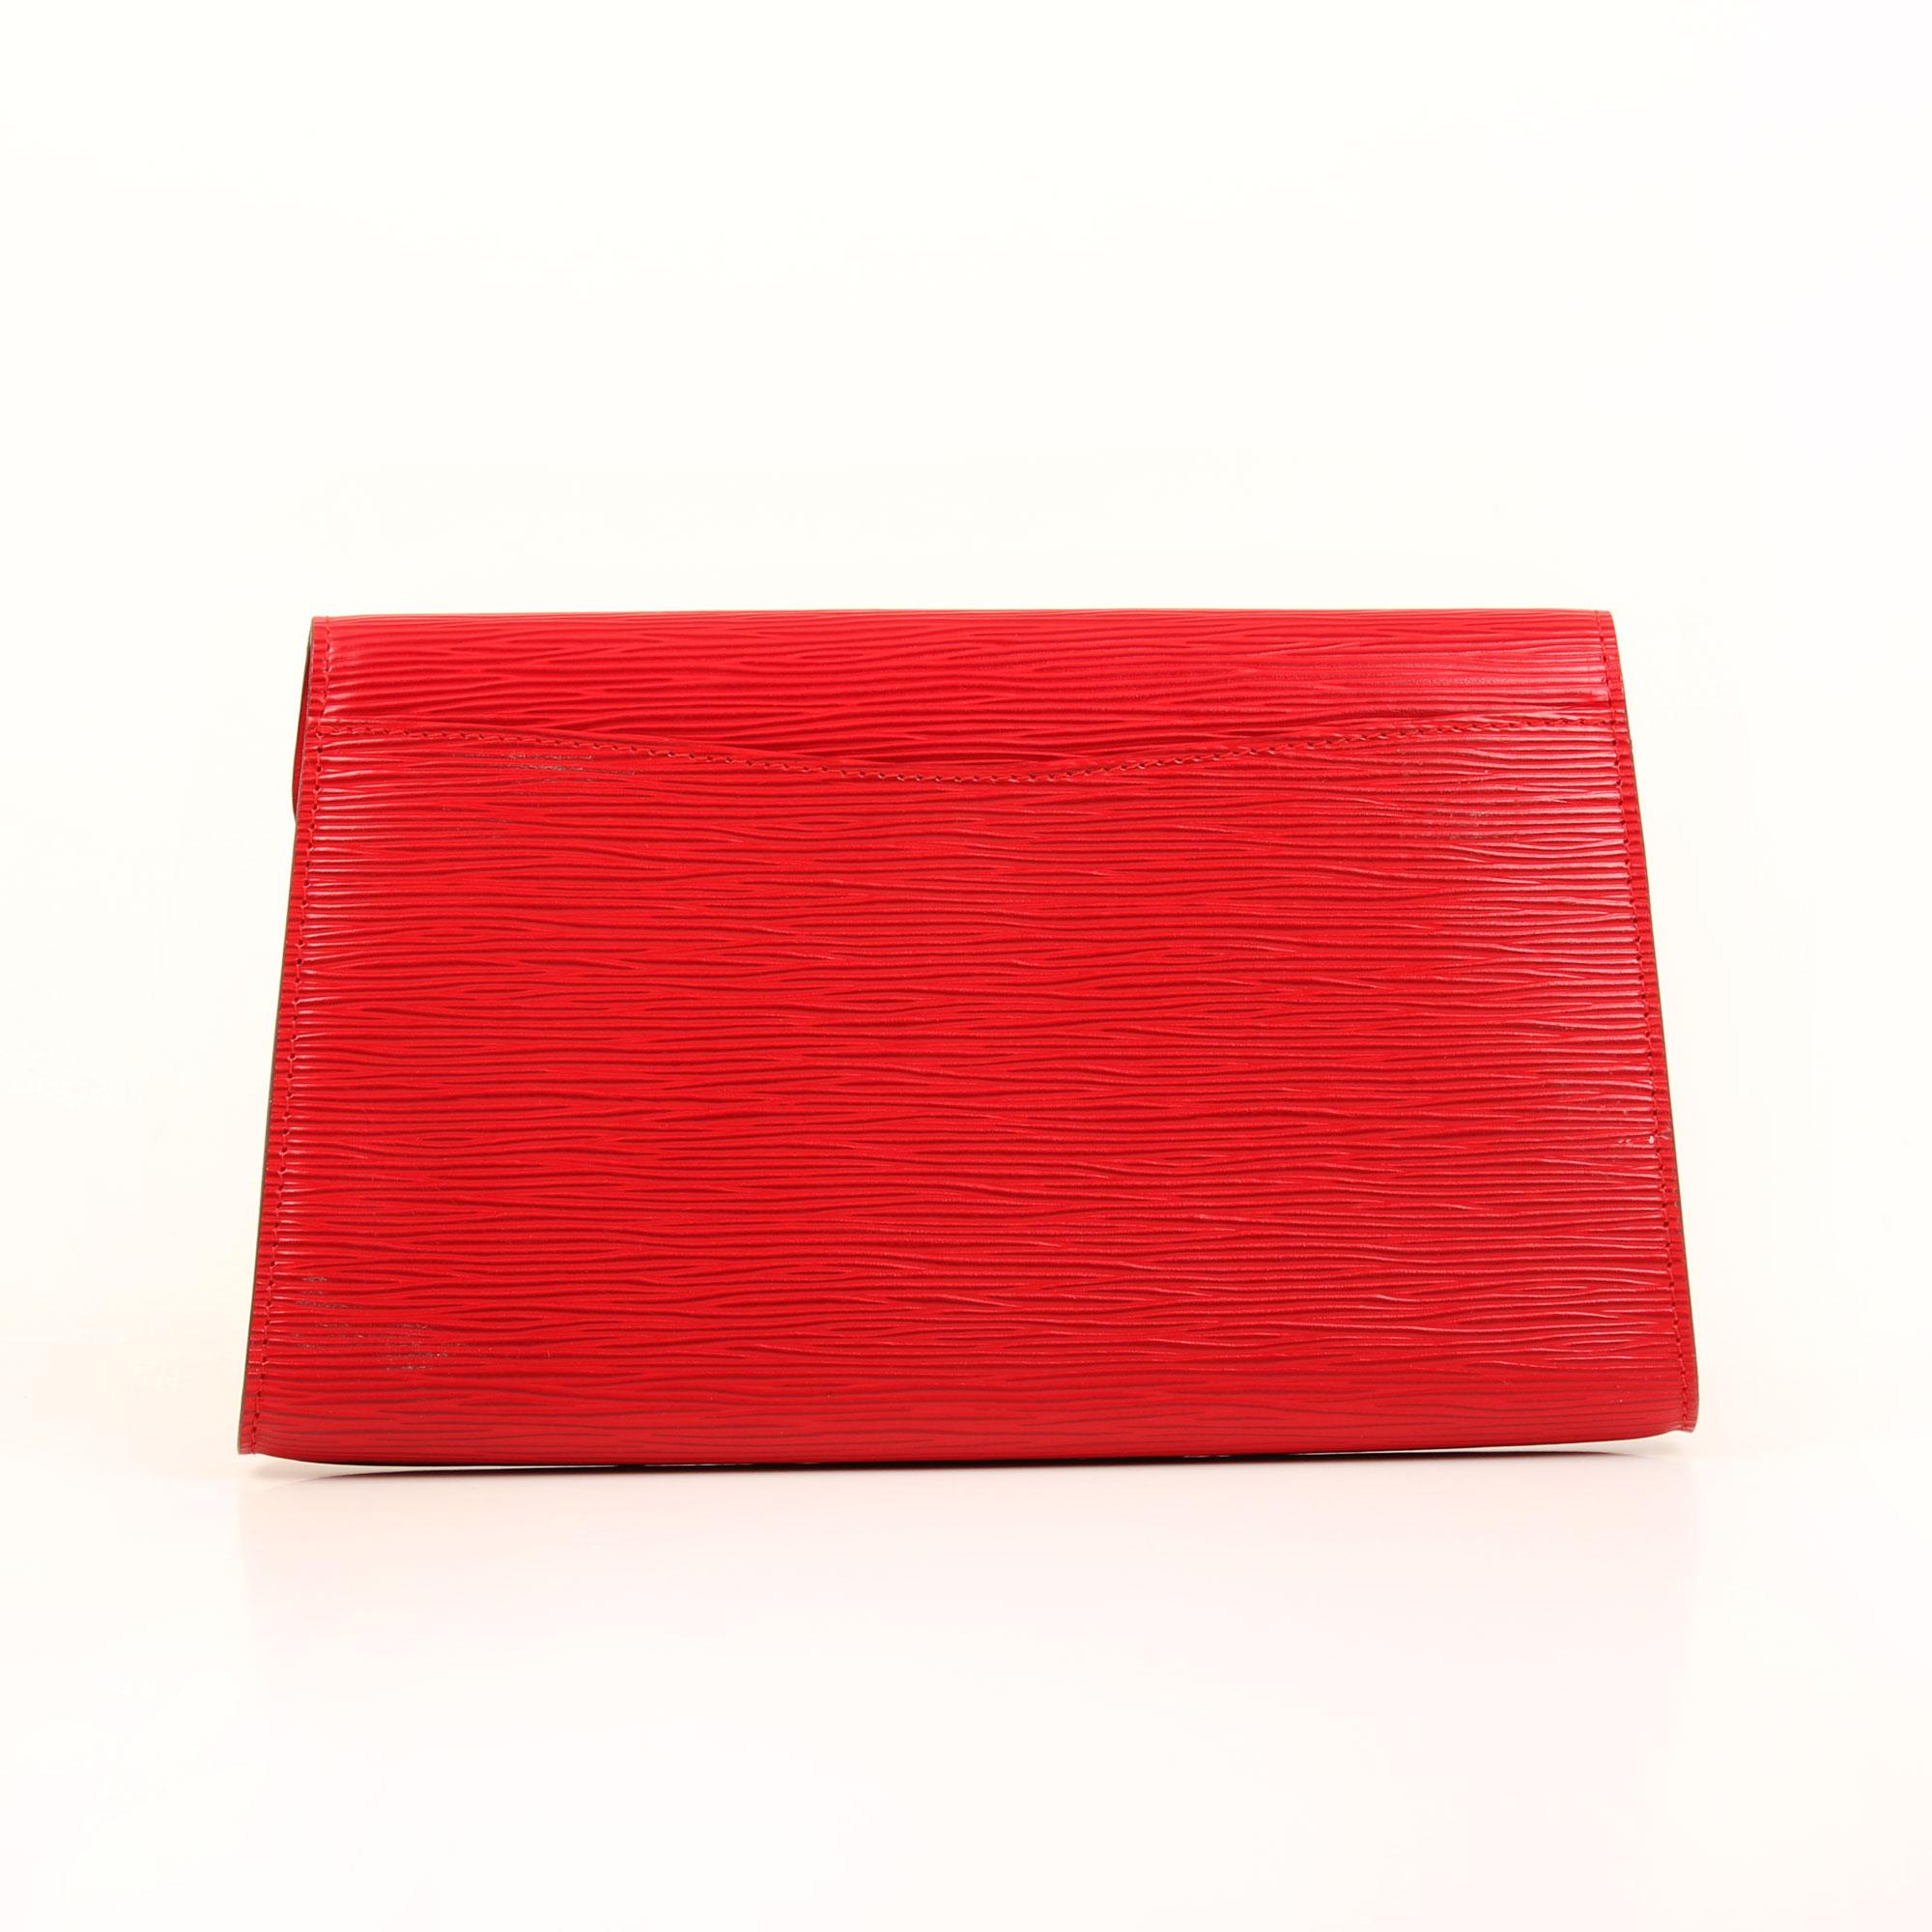 Back image of louis vuitton vintage red epi clutch